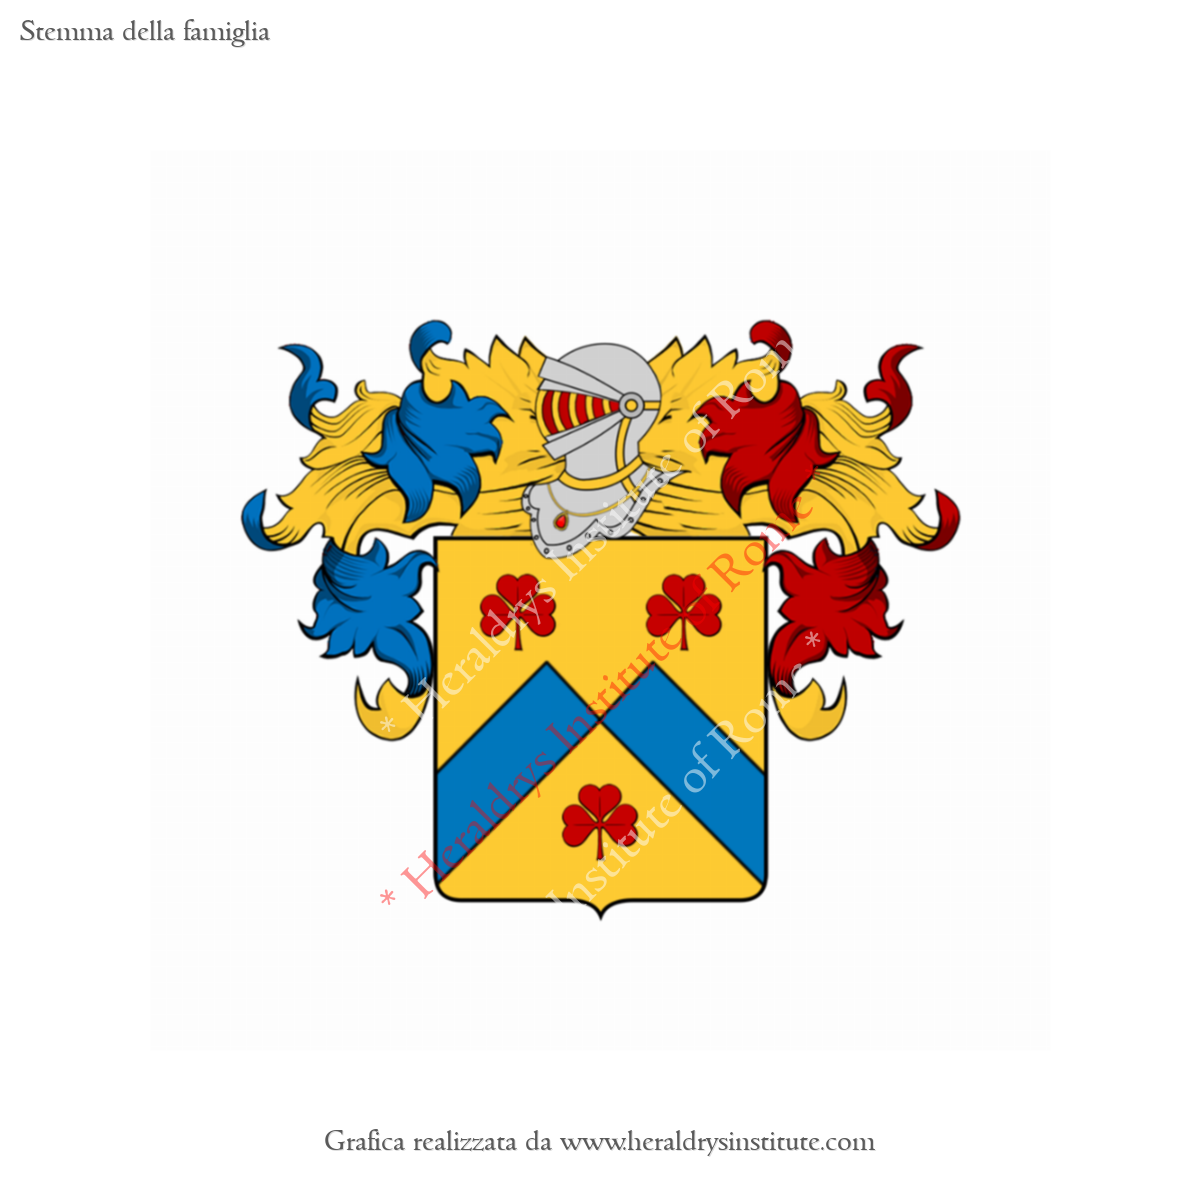 Loustalot Family Heraldry, Genealogy, Coat Of Arms And